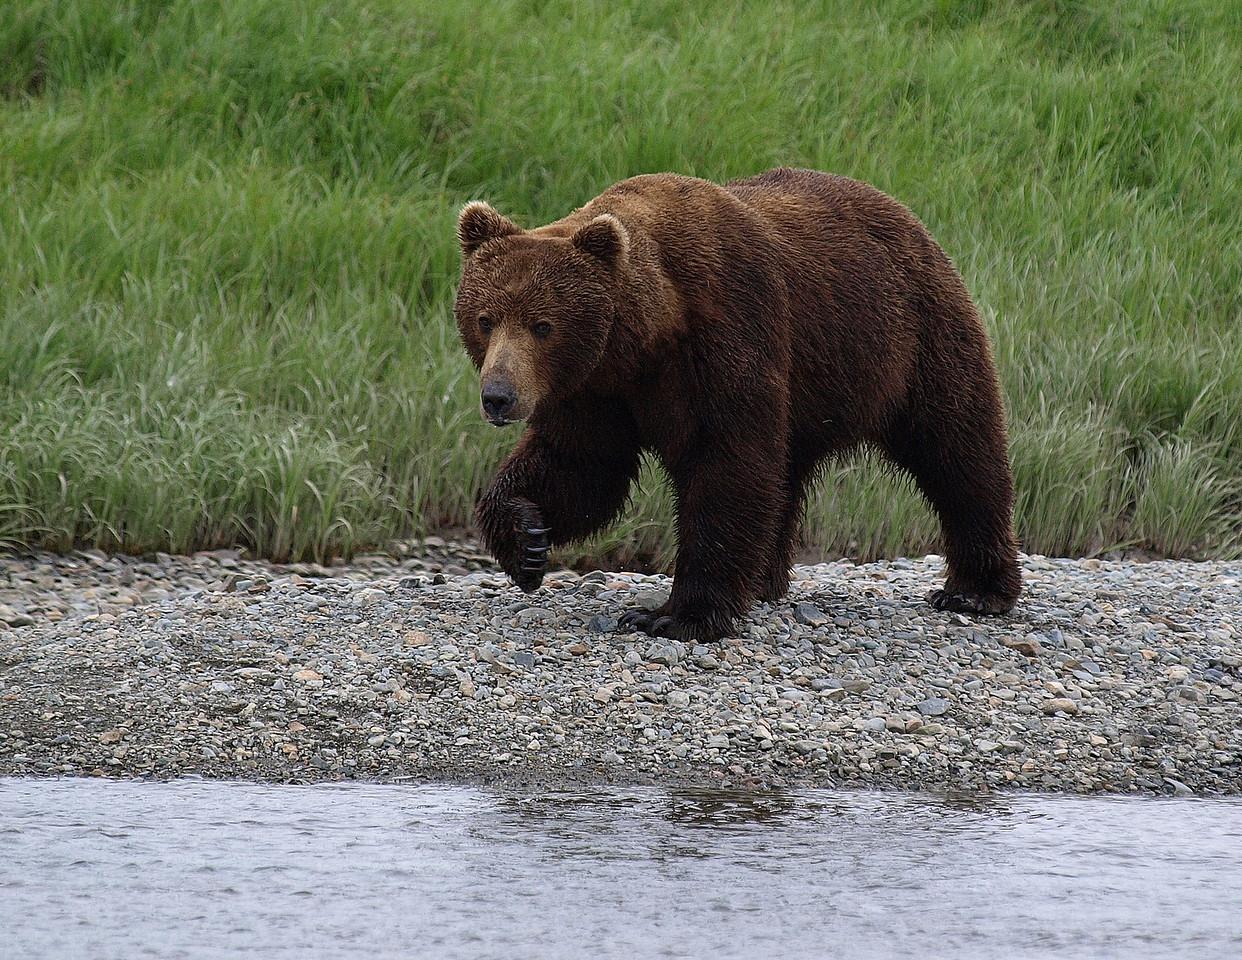 Nice dark brown bear - with nice big claws.